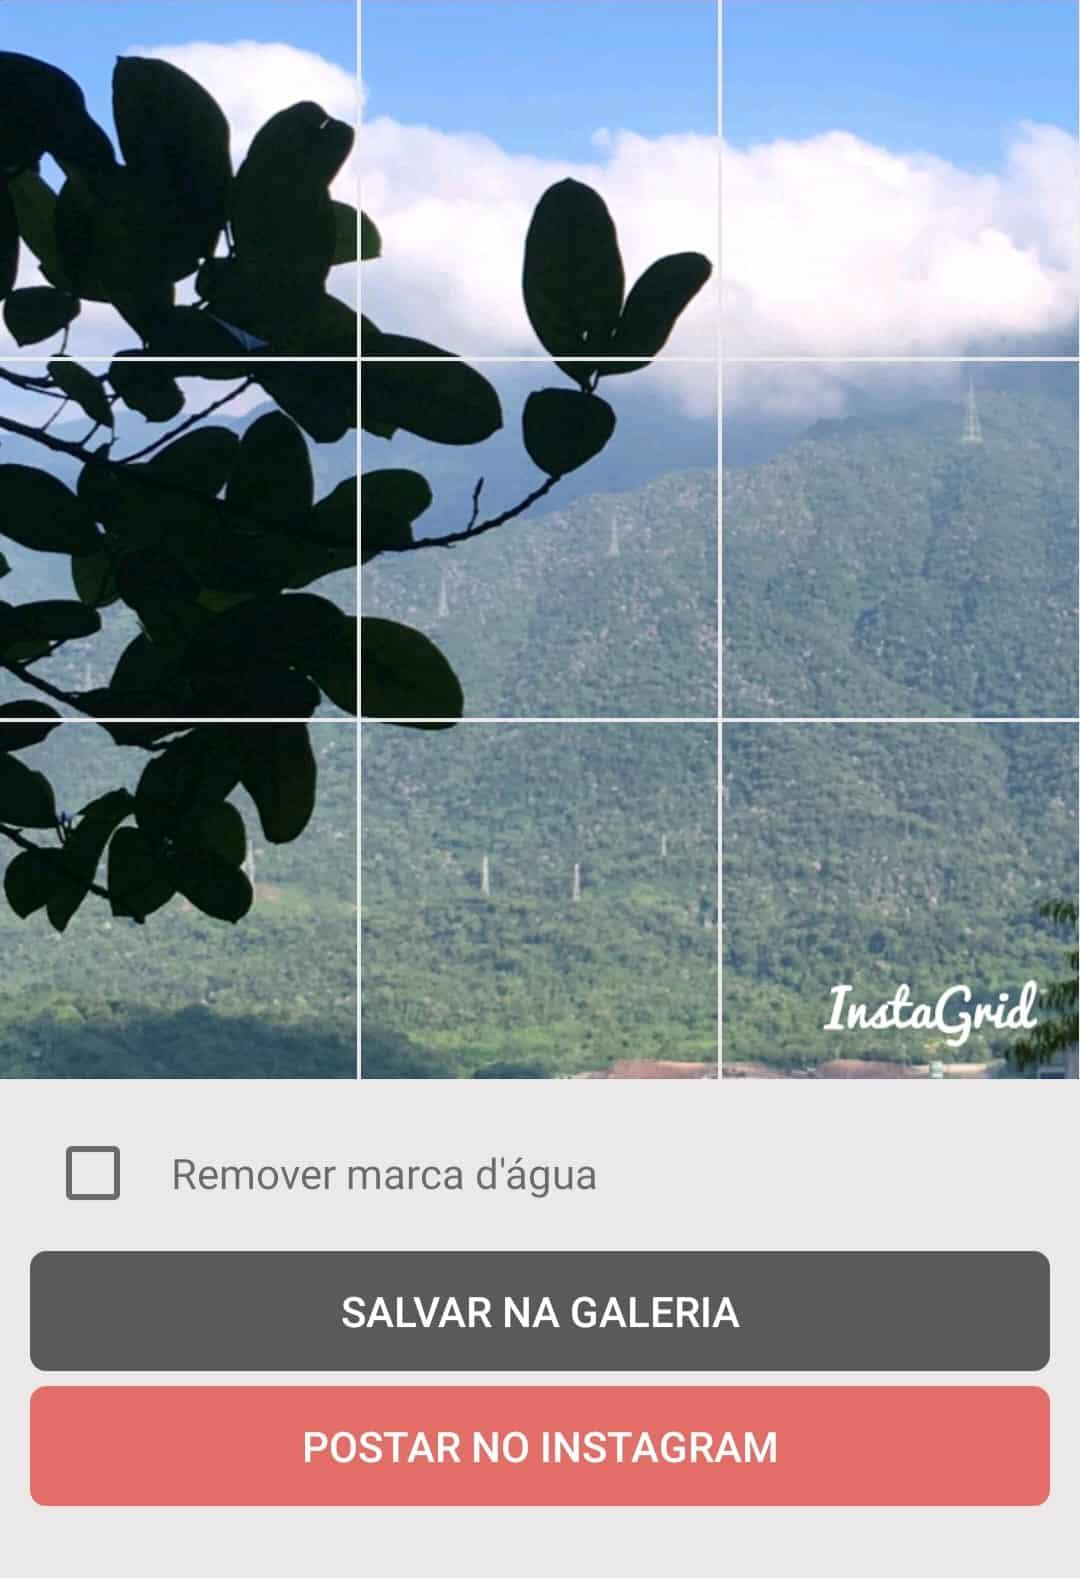 Mosaico Instagram Postar